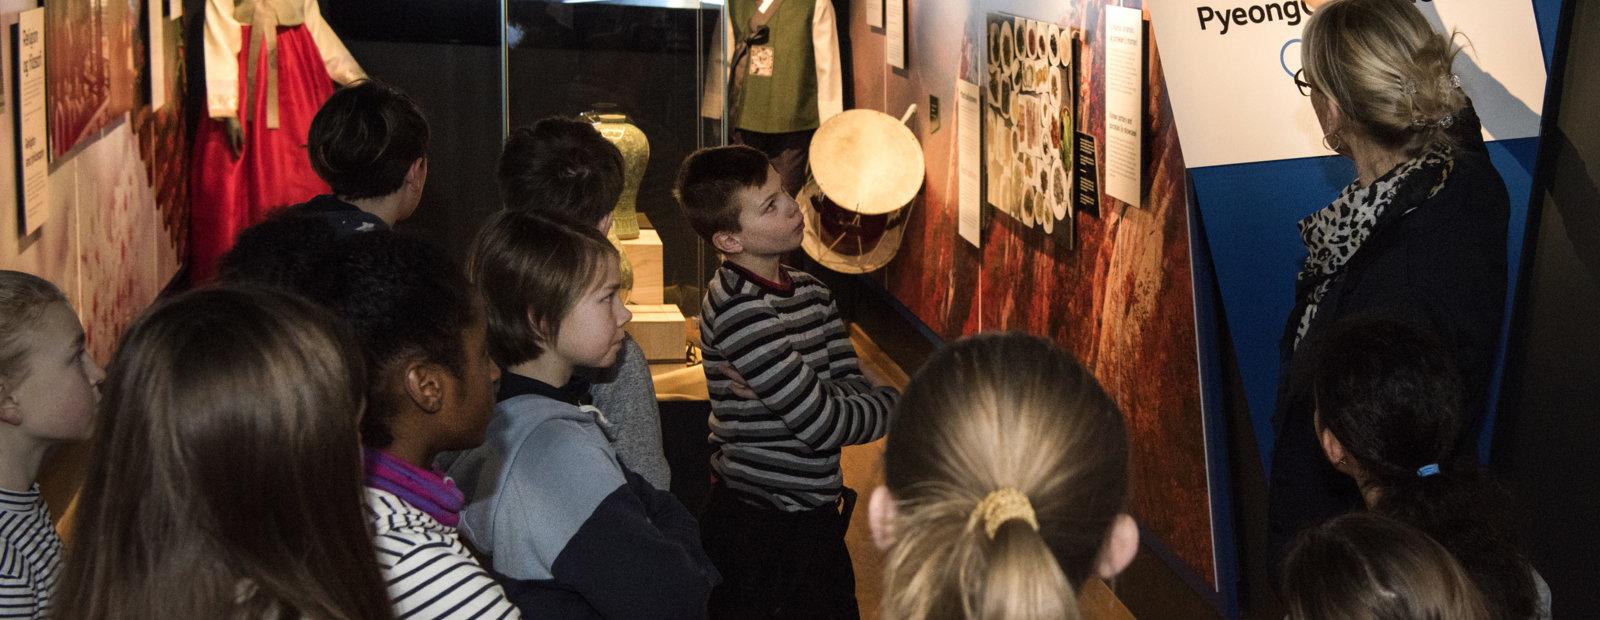 En omviser viser og forteller en gruppe barn i Norges Olympiske Museum på Lillehammer.